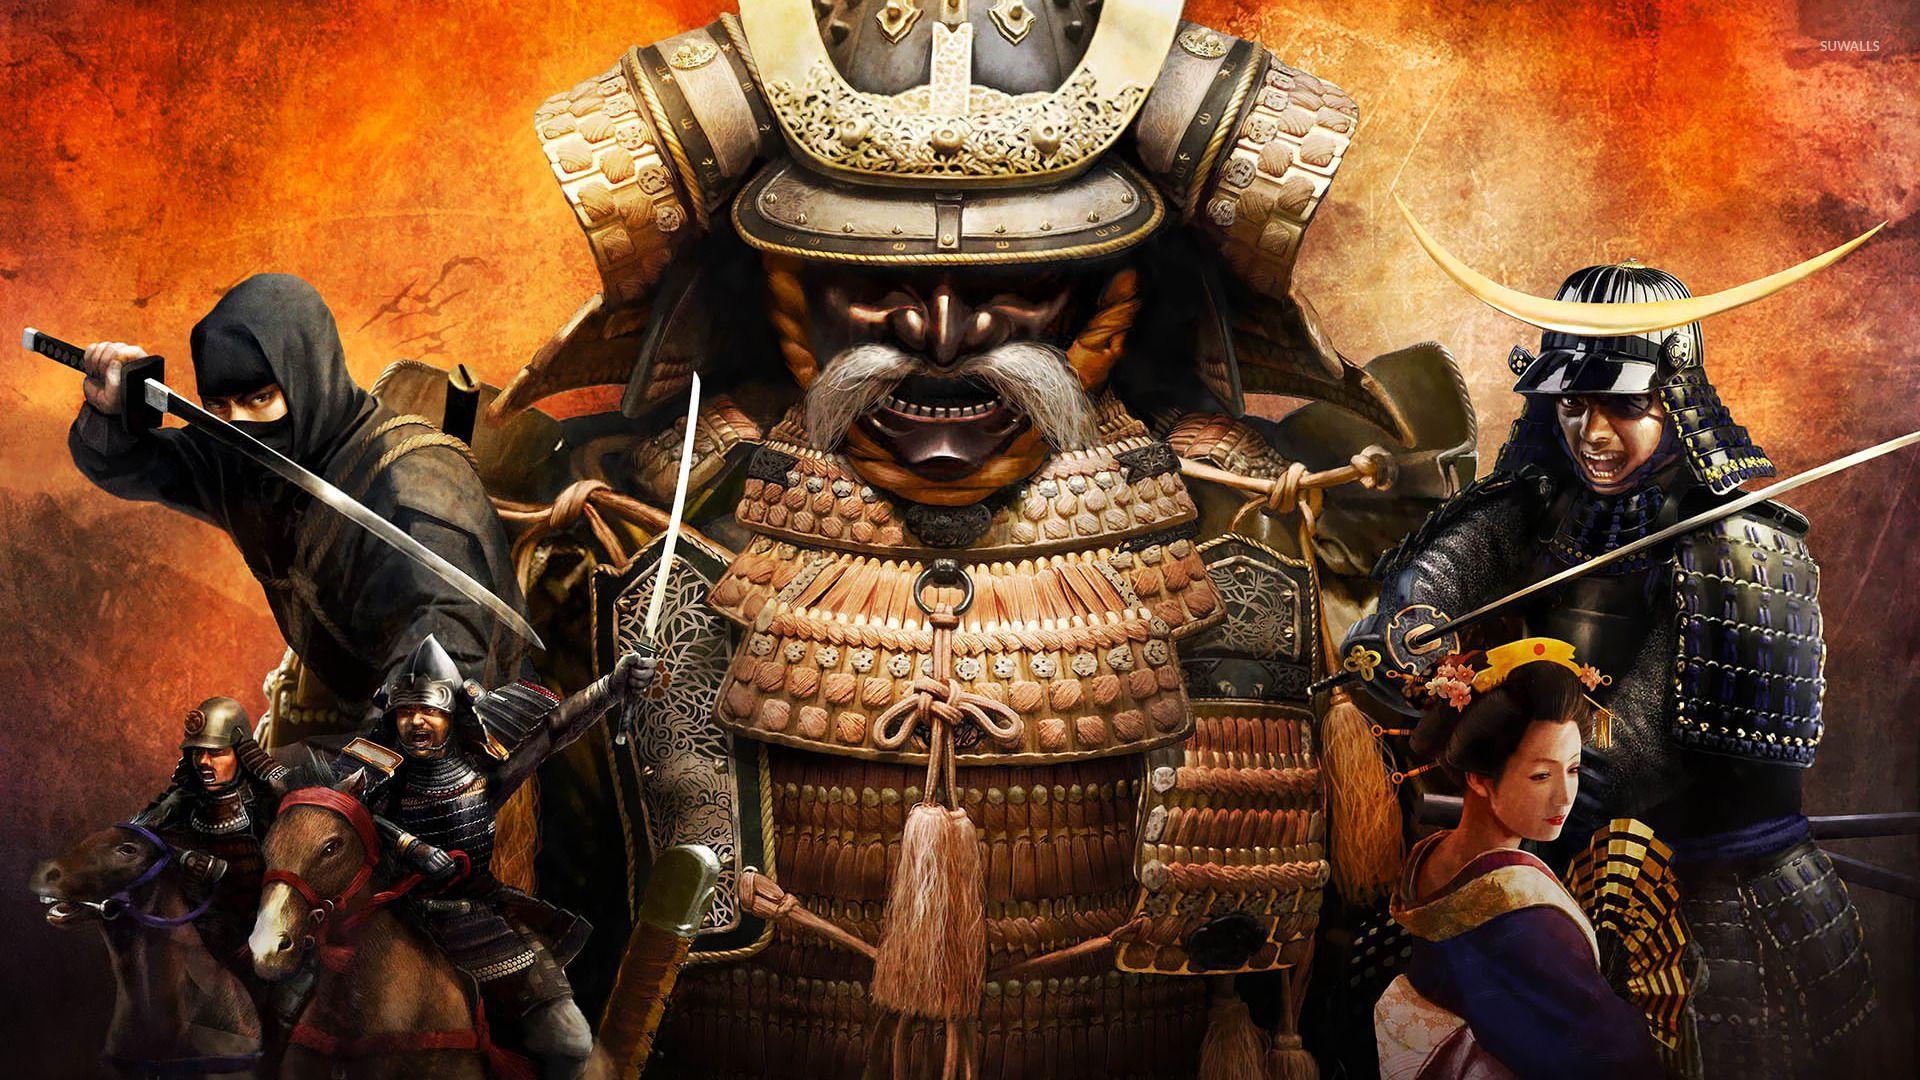 Shogun Wallpapers Top Free Shogun Backgrounds Wallpaperaccess